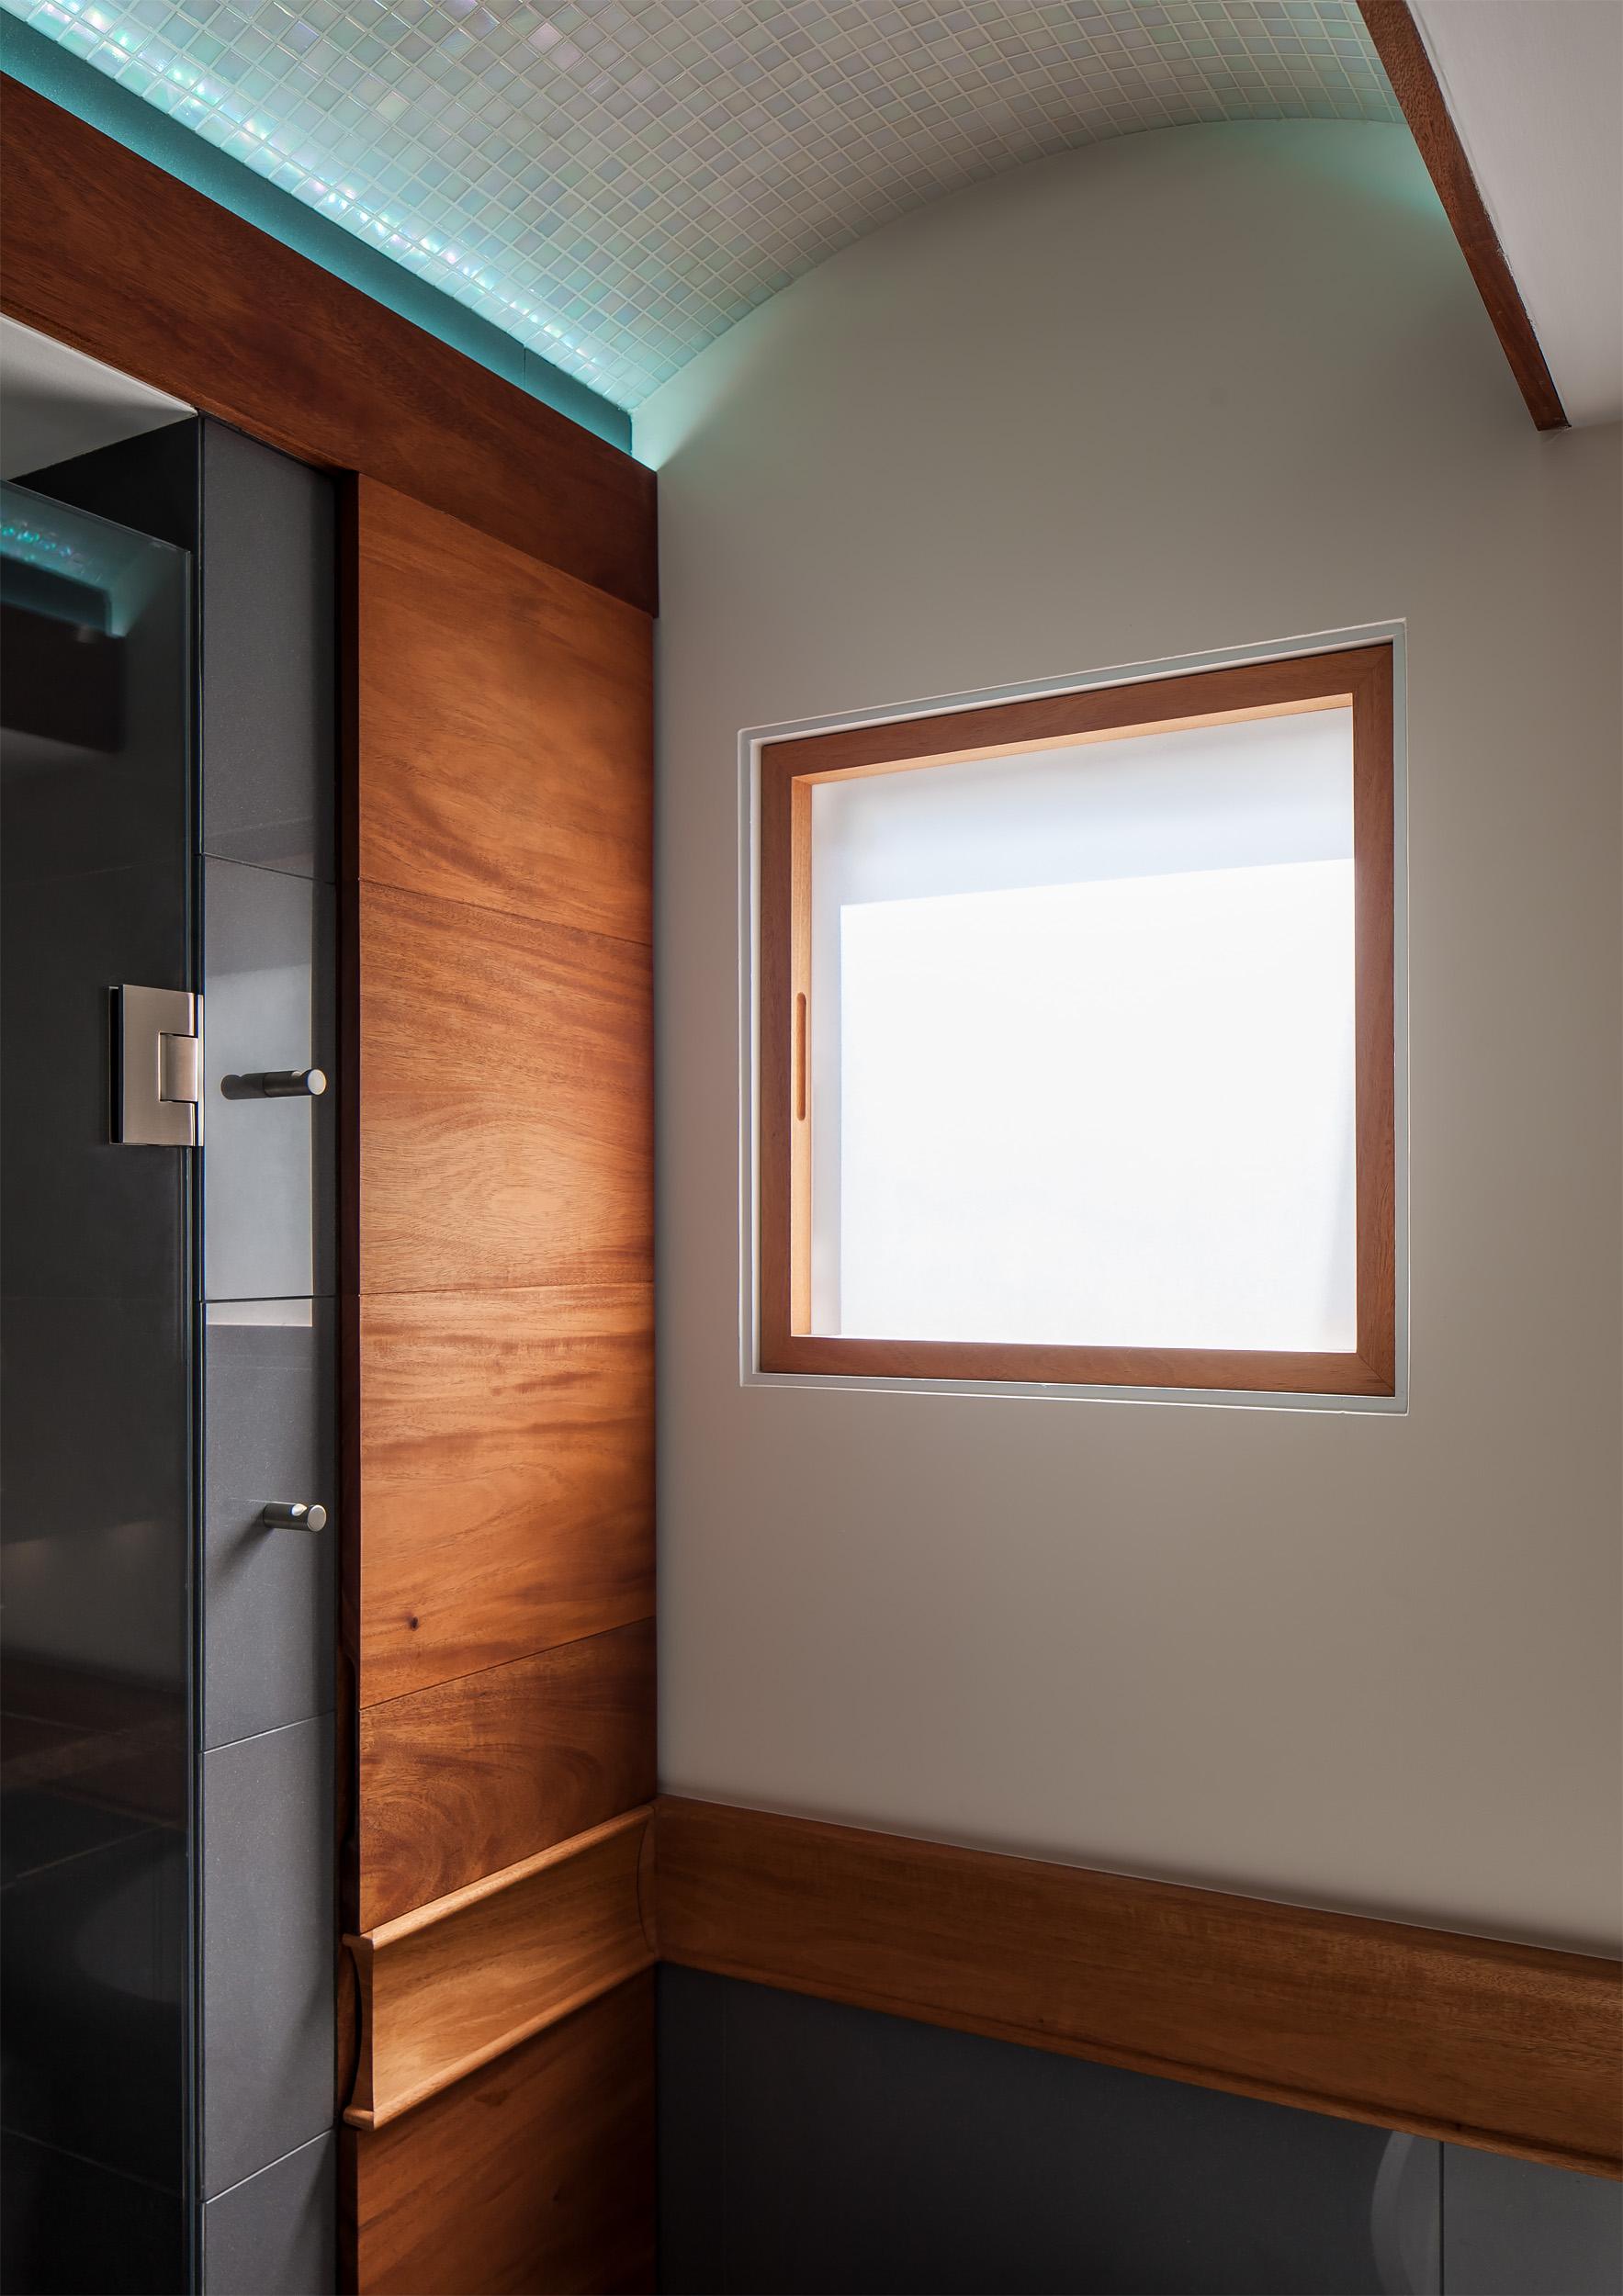 2. Bathroom window and vault.jpg